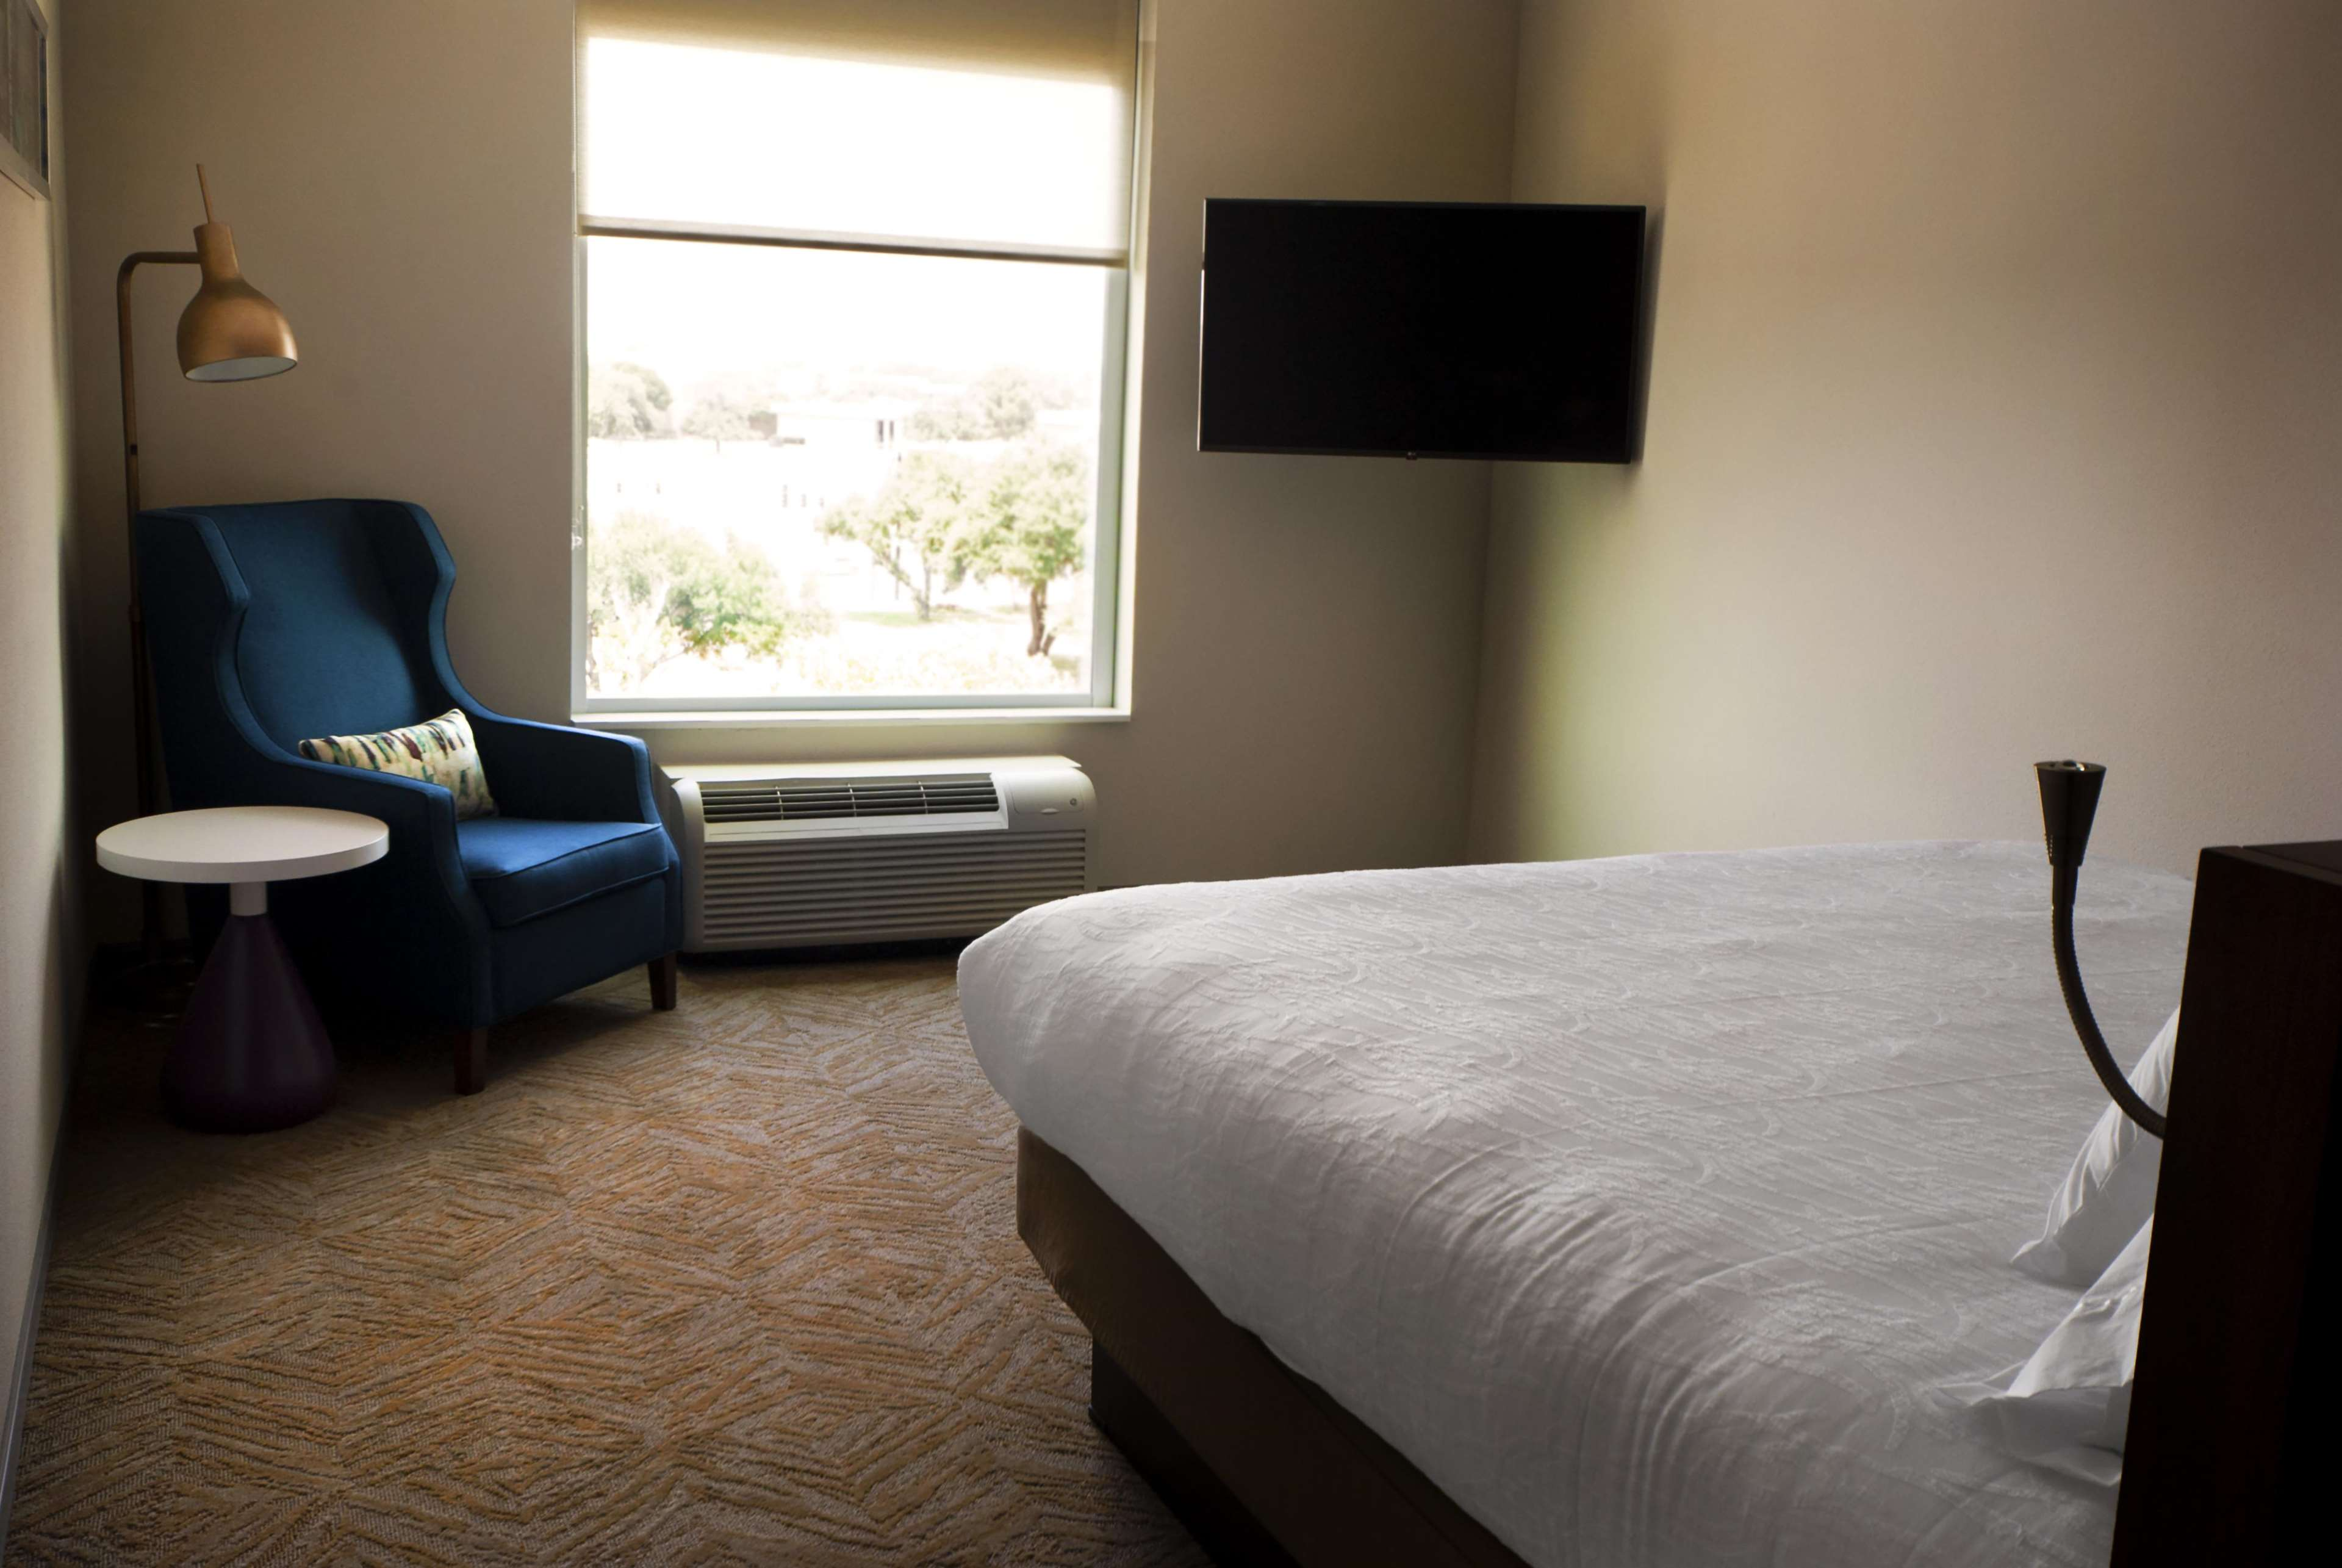 Hilton Garden Inn Dallas at Hurst Conference Center image 39